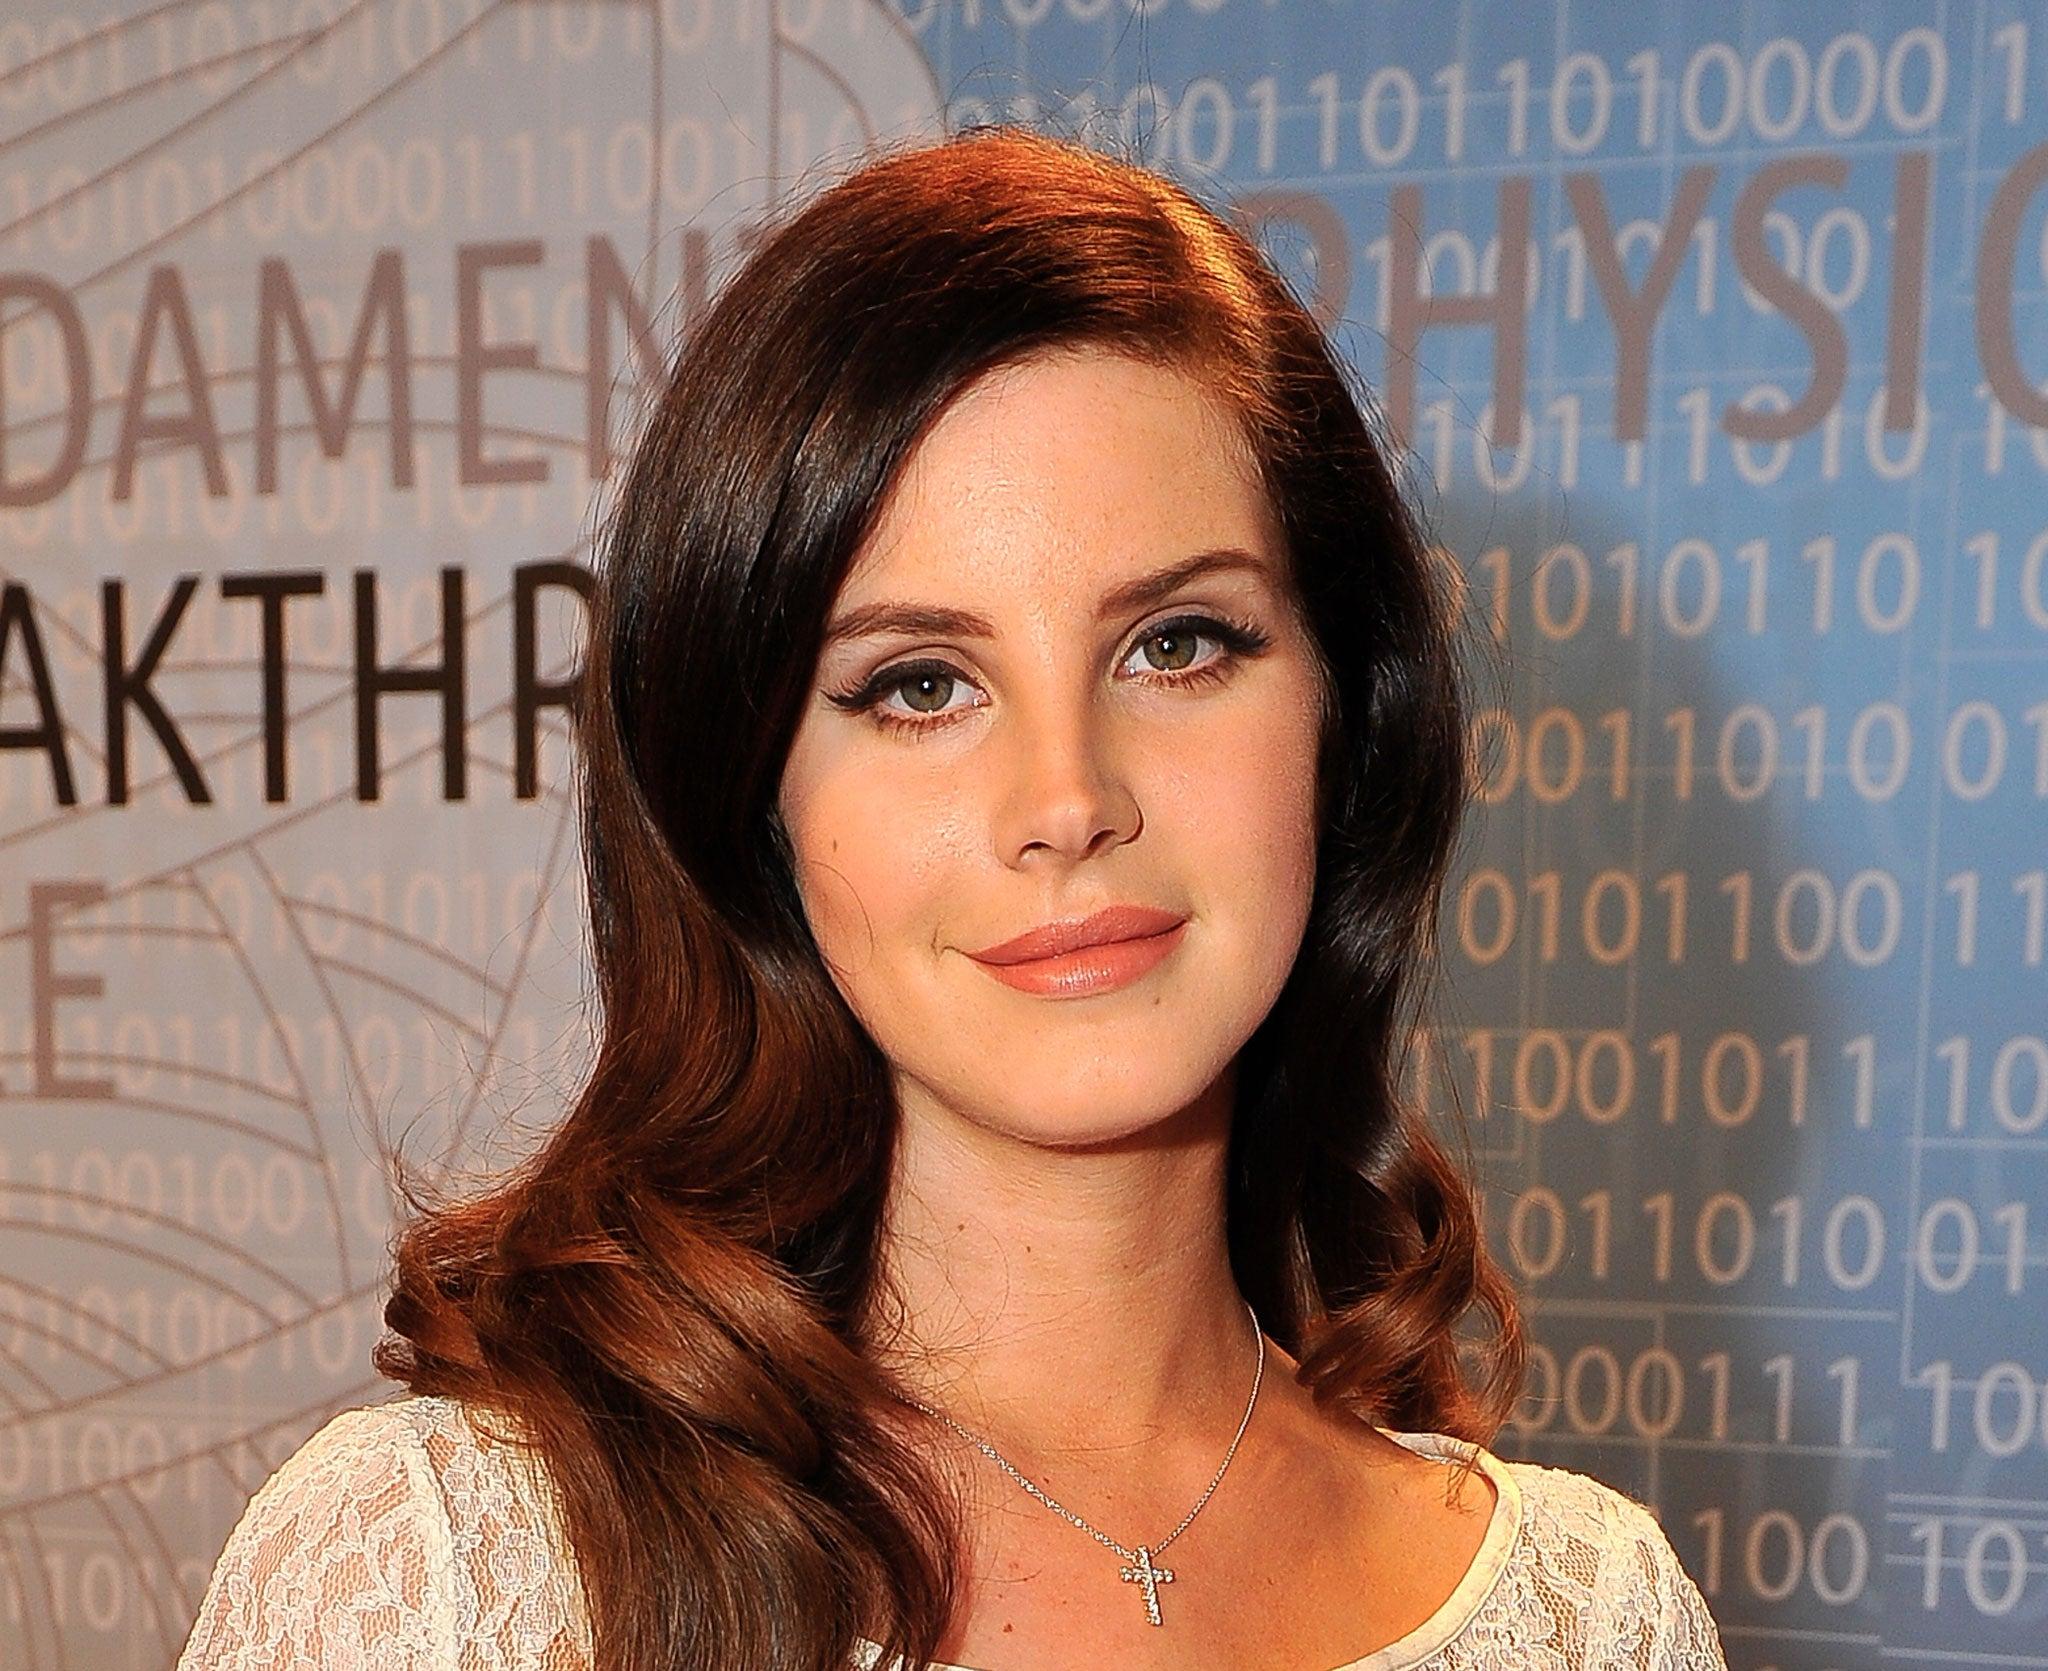 Pics Photos - Lana Del Rey 264652 Jpg I